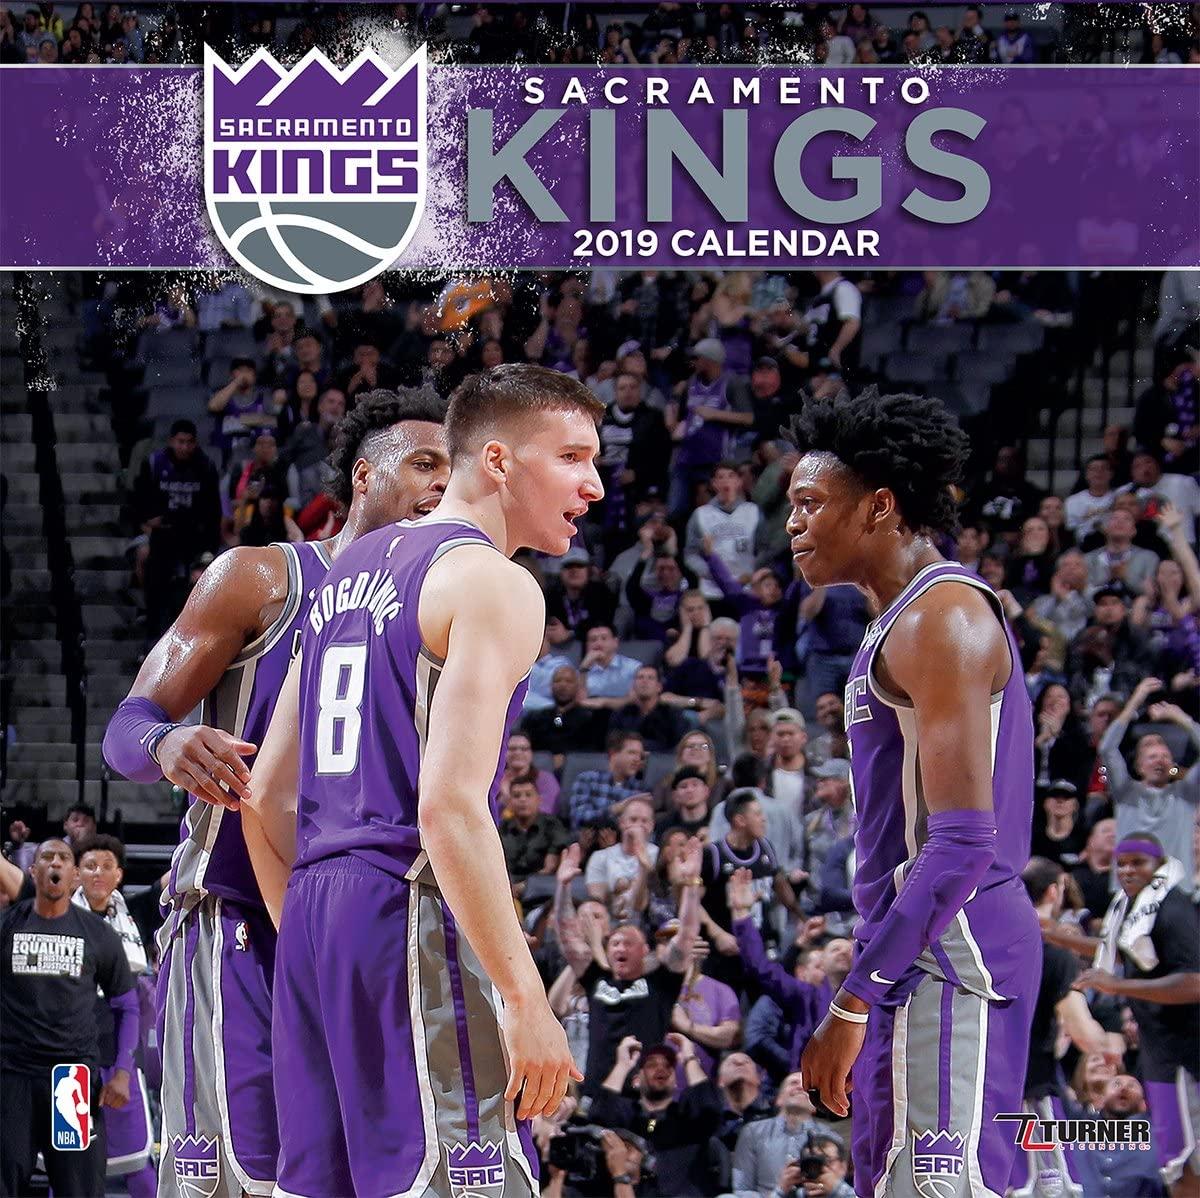 Turner Sport Sacramento Kings 2019 12X12 Team Wall Calendar Wall Calendar (19998011894)